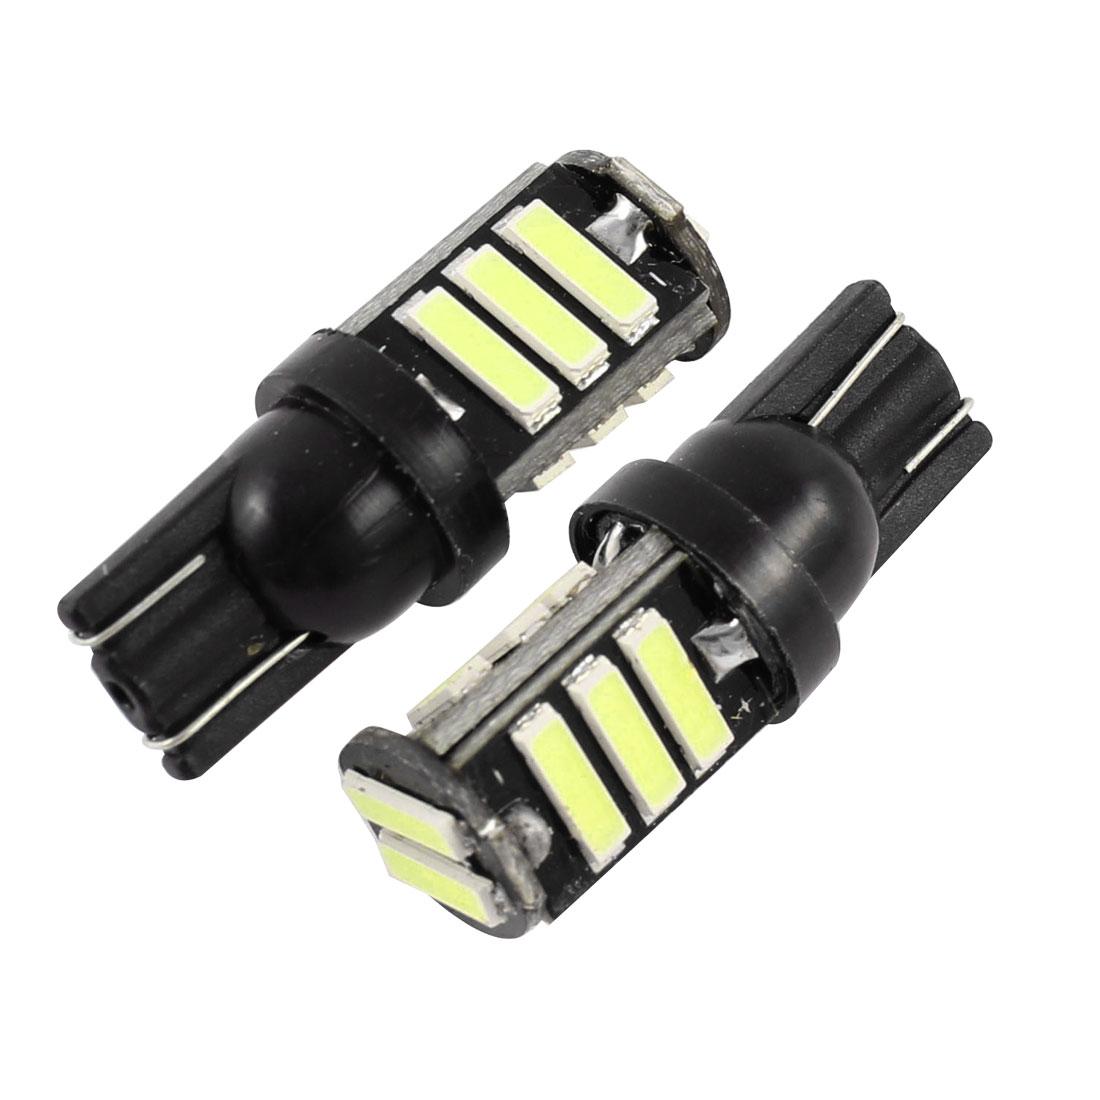 2 Pcs T10 W5W 7020 11-SMD LED Car Dashboard Light Bulbs White Internal